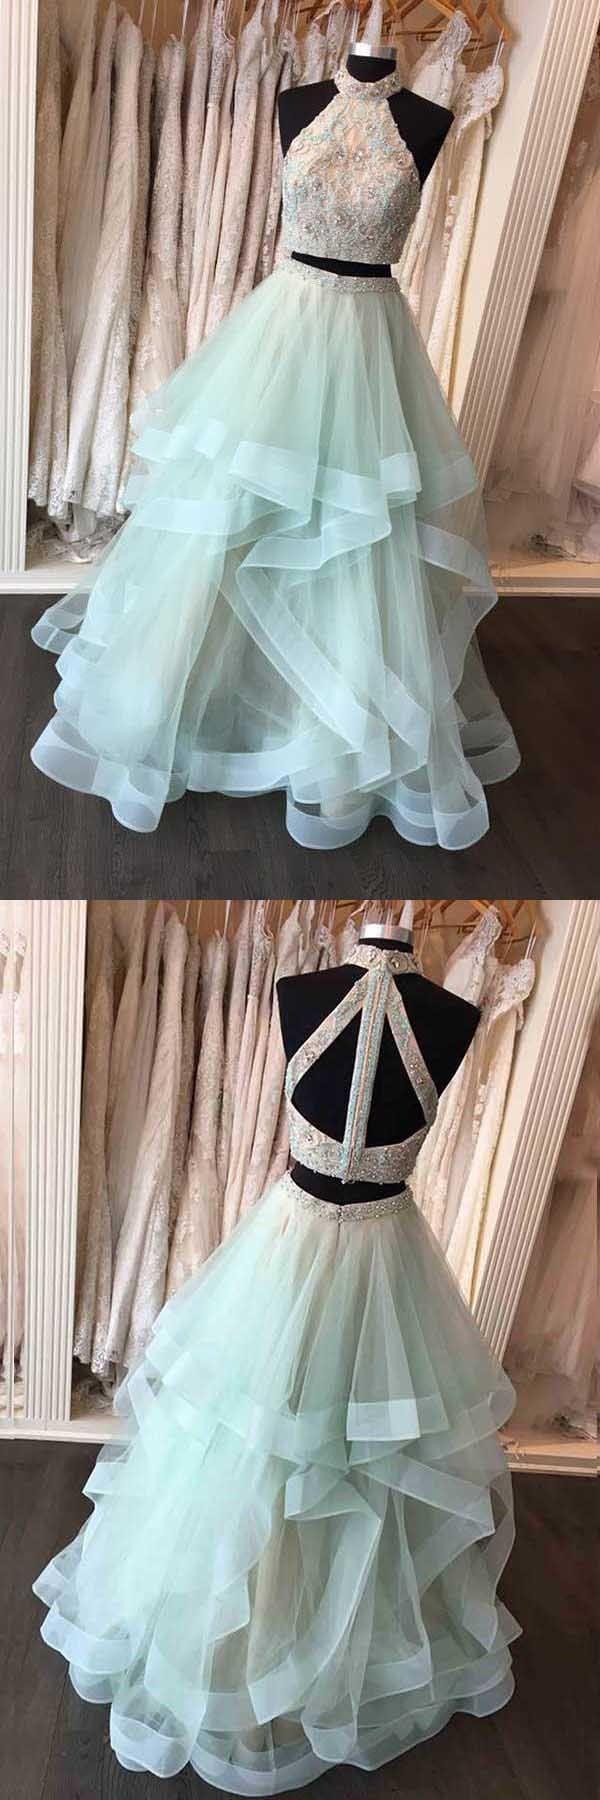 4305 best Weddings images on Pinterest | Homecoming dresses, Ball ...